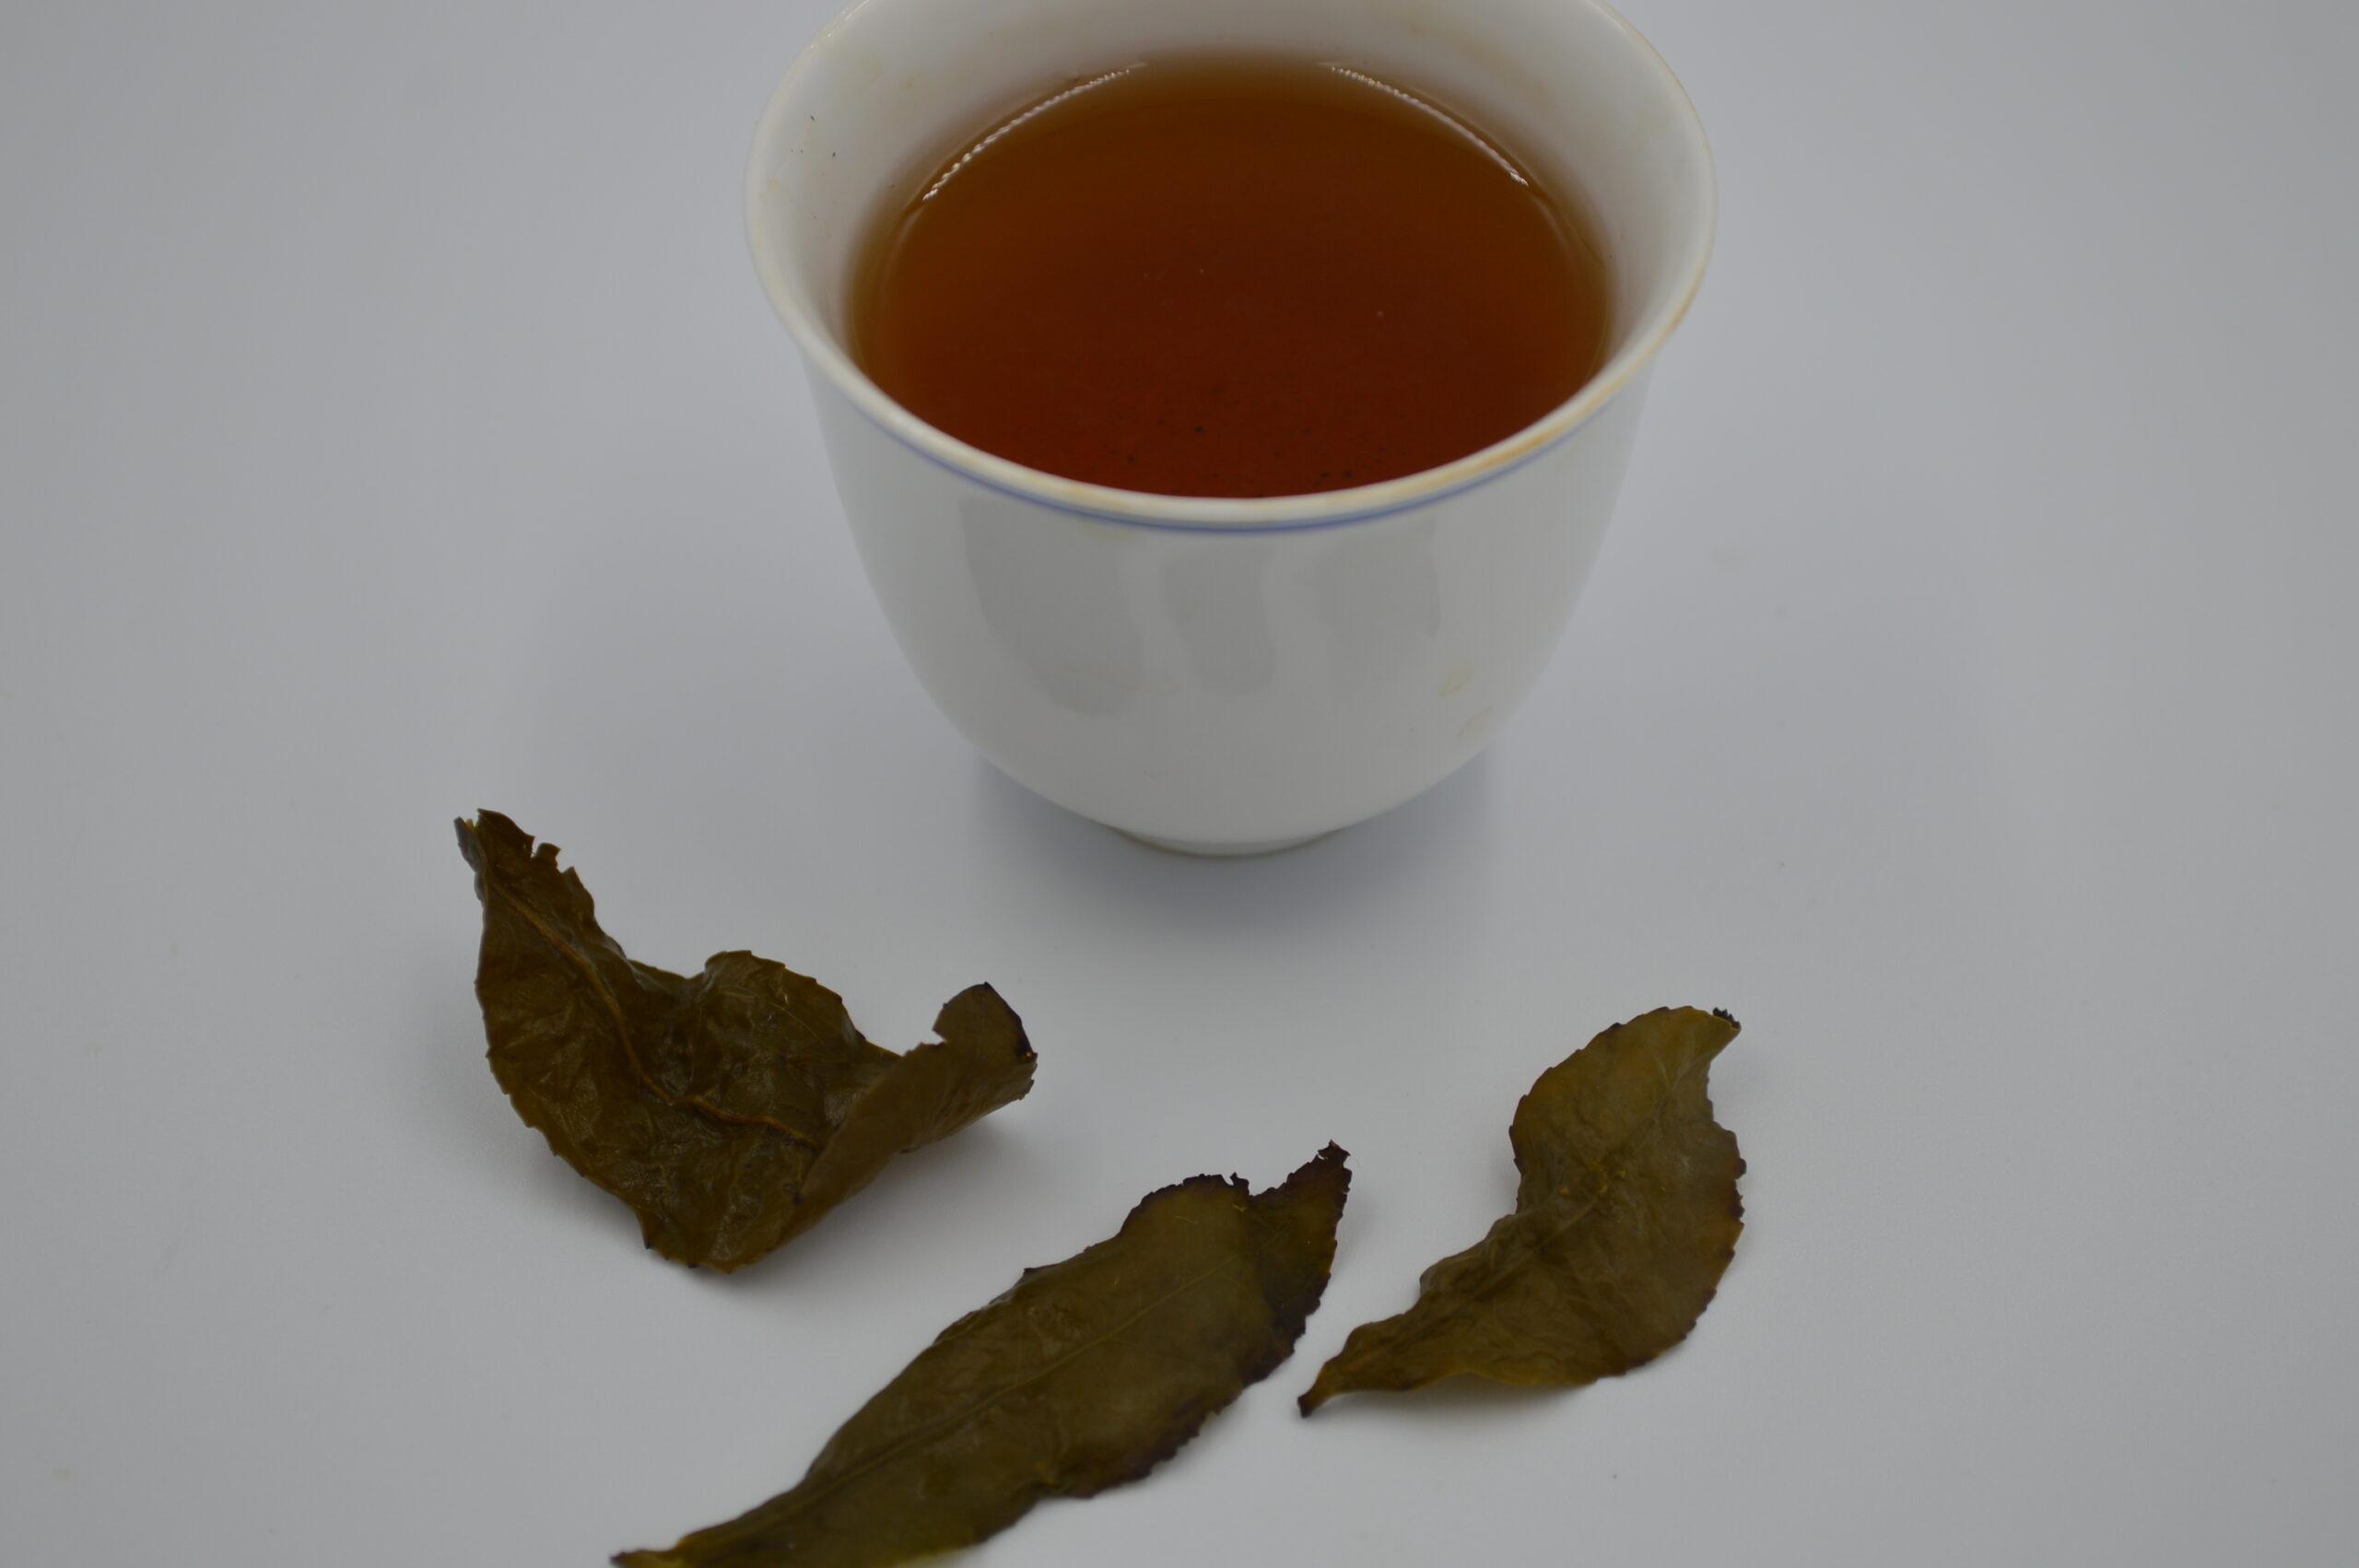 https://shop.liu-tea-art.com/wp-content/uploads/2021/05/DSC_0089-scaled.jpg